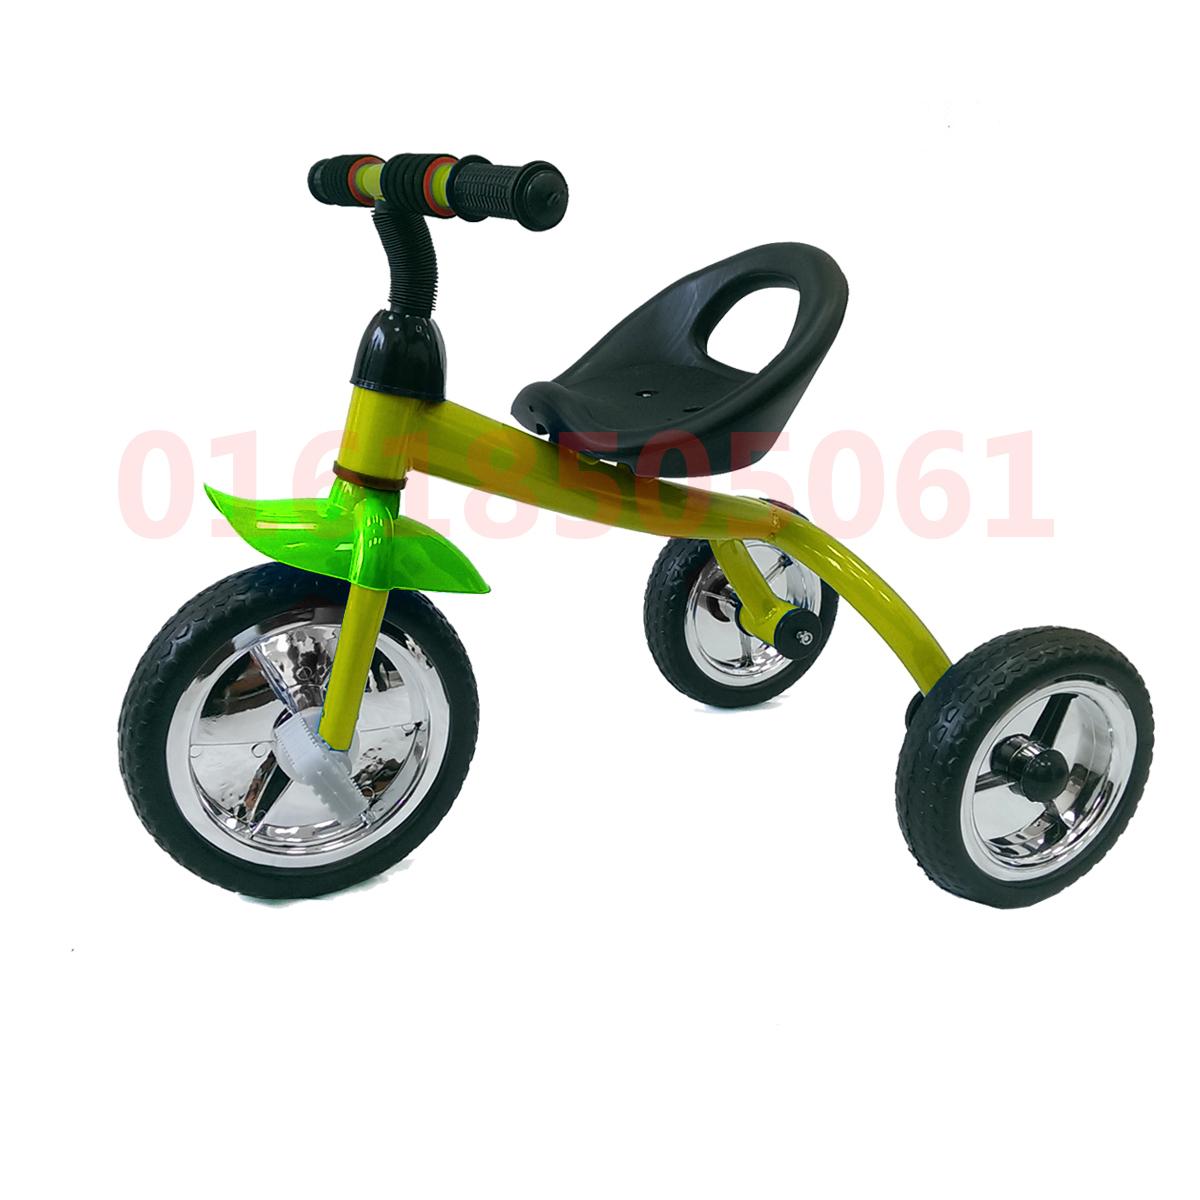 3 wheel kids ride on tricycle bike children ride toddler. Black Bedroom Furniture Sets. Home Design Ideas